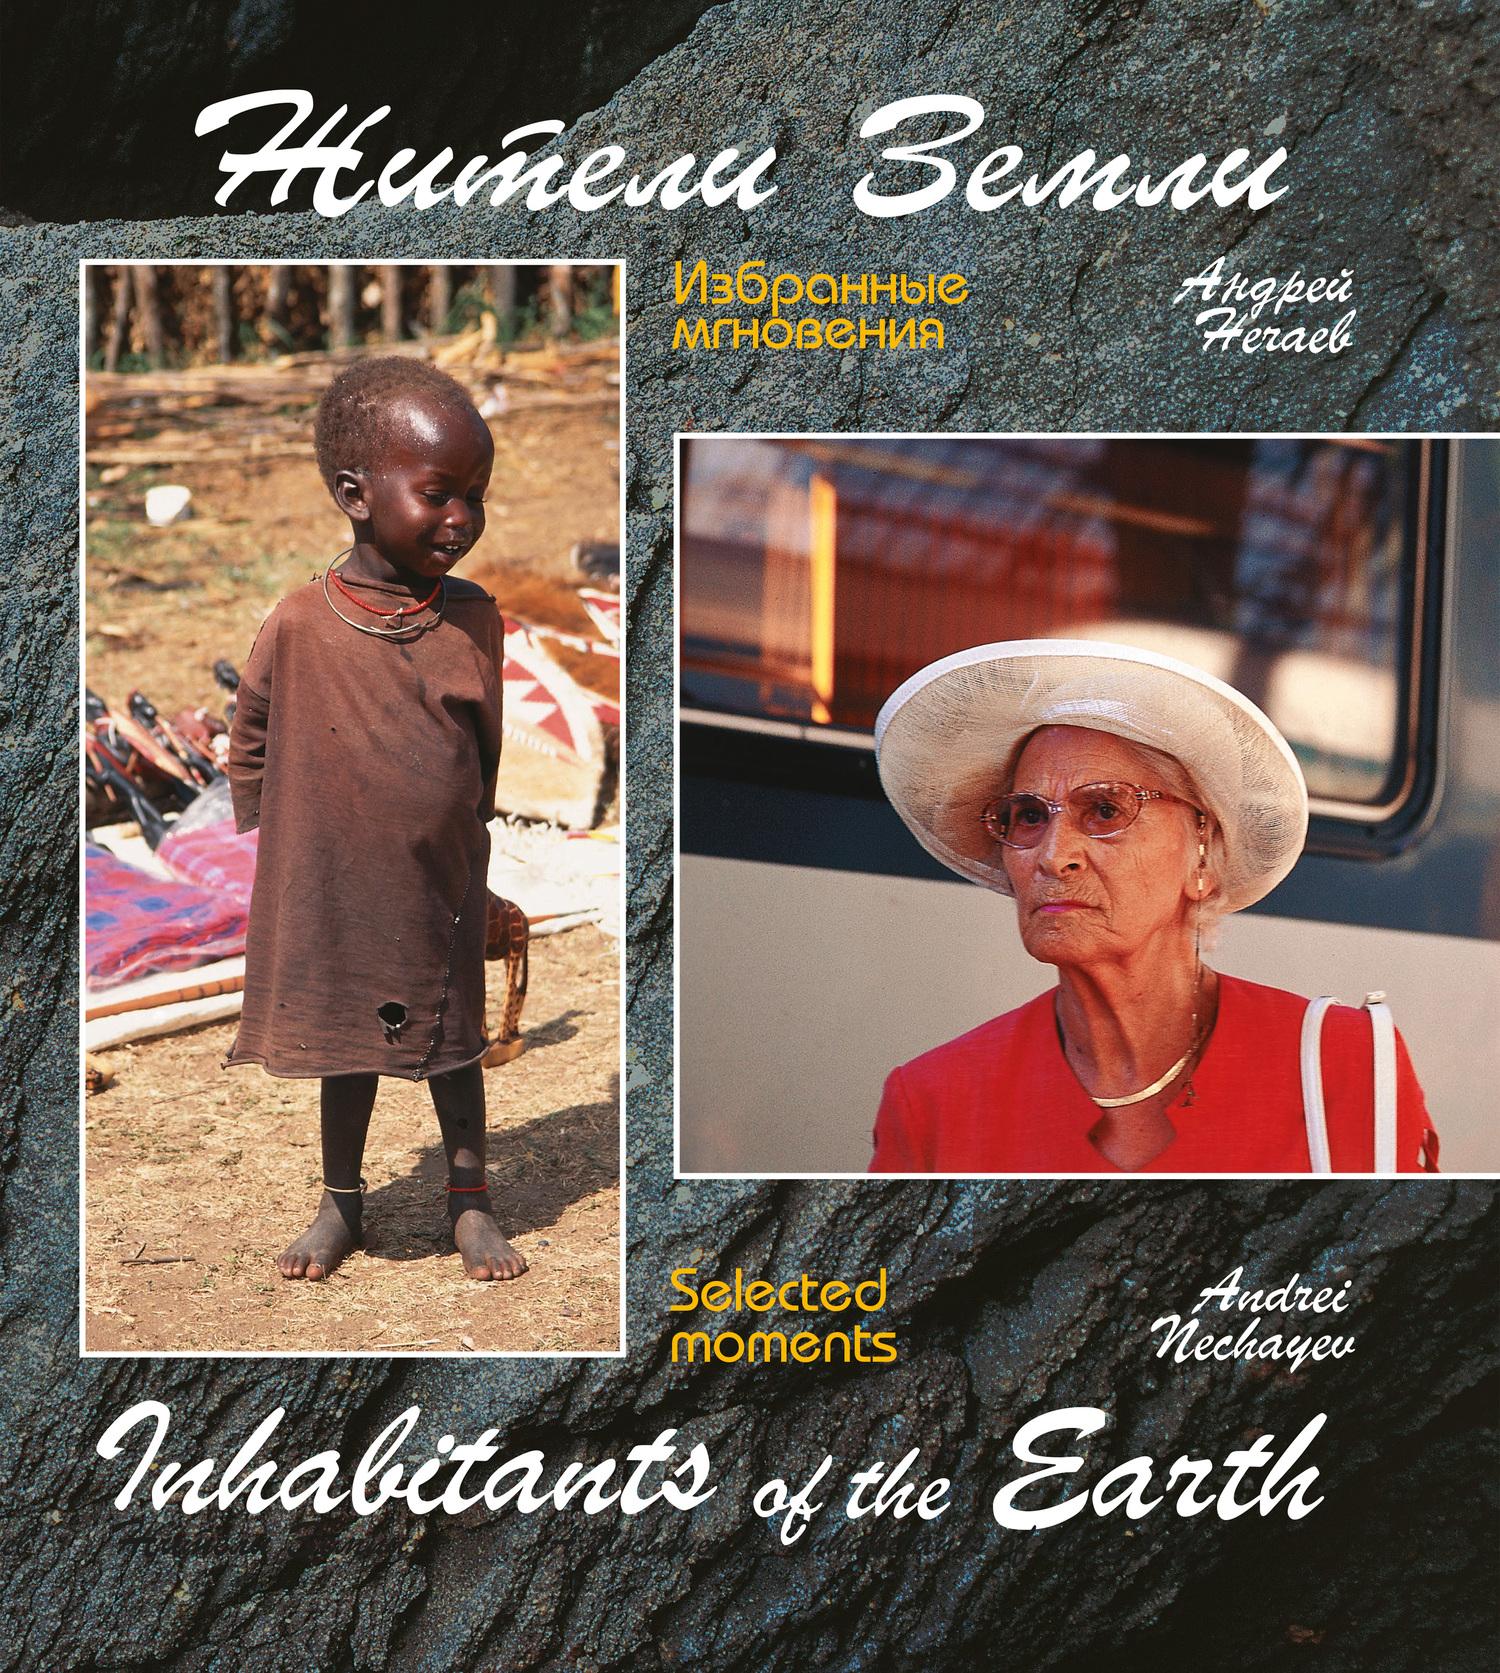 Андрей Нечаев. Жители Земли. Избранные мгновения (Inhabitants of the Earth. Selected moments)